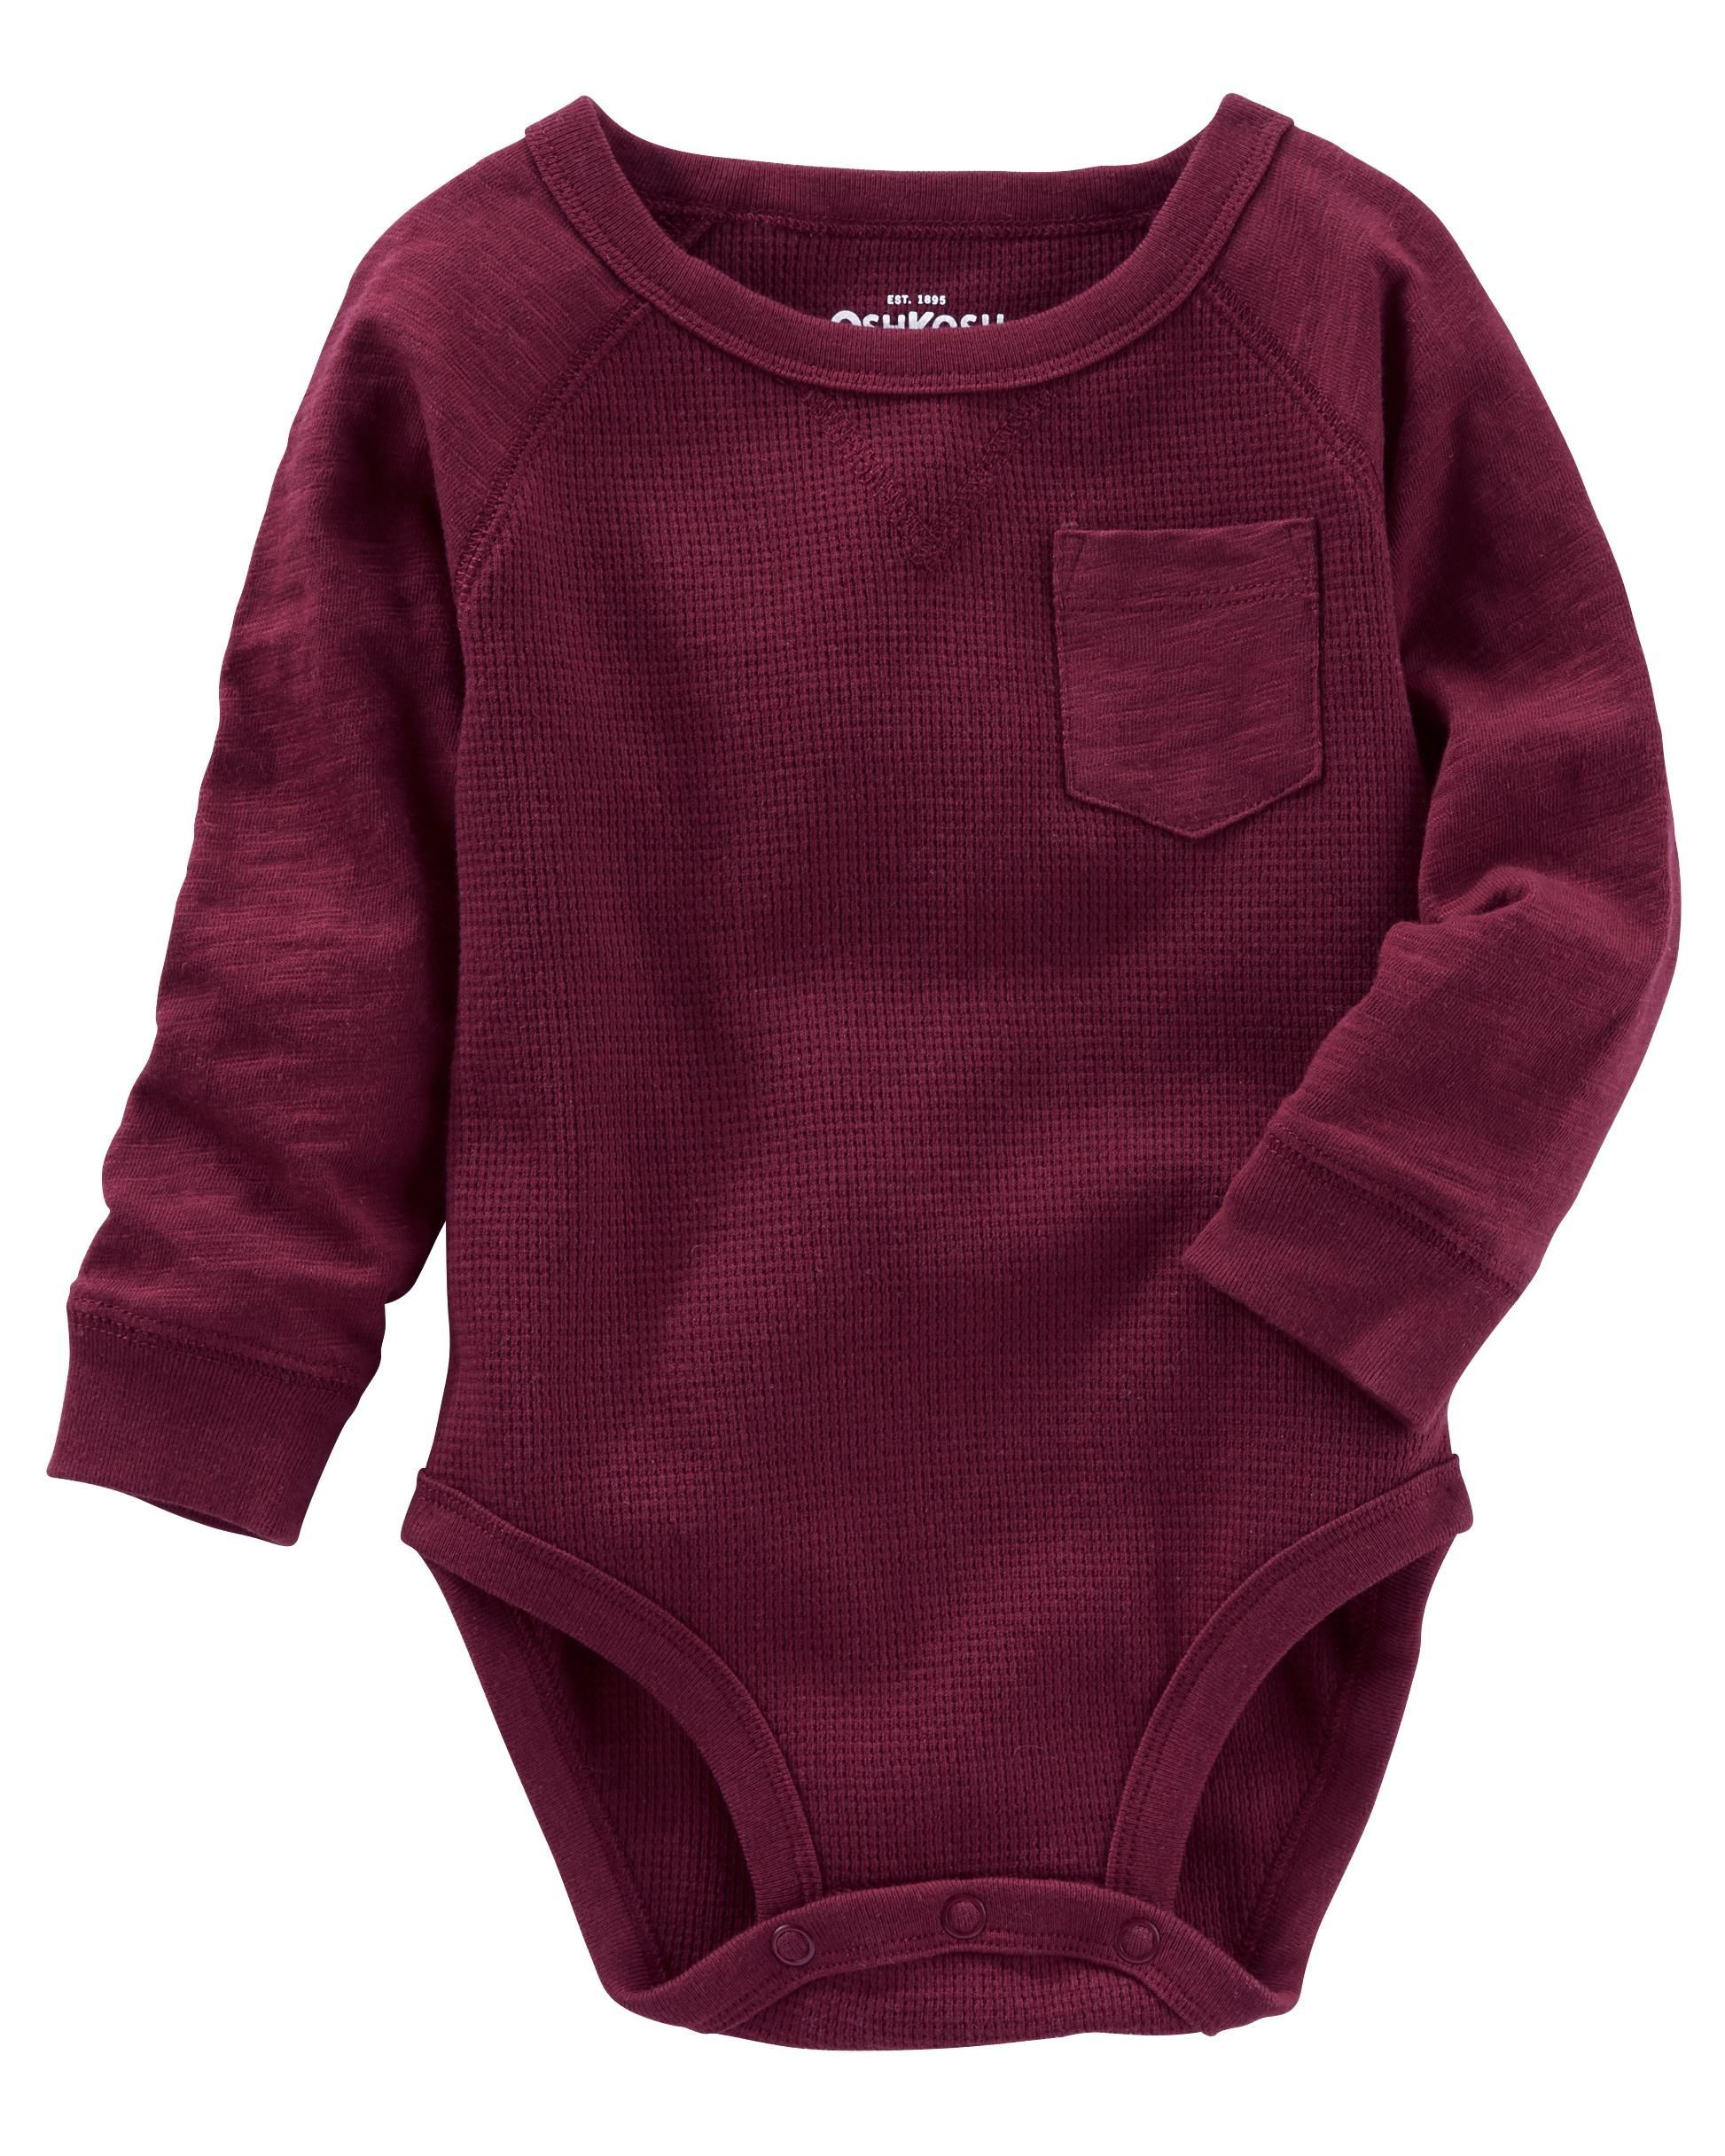 Baby Boy Raglan Pocket Thermal Bodysuit Carters